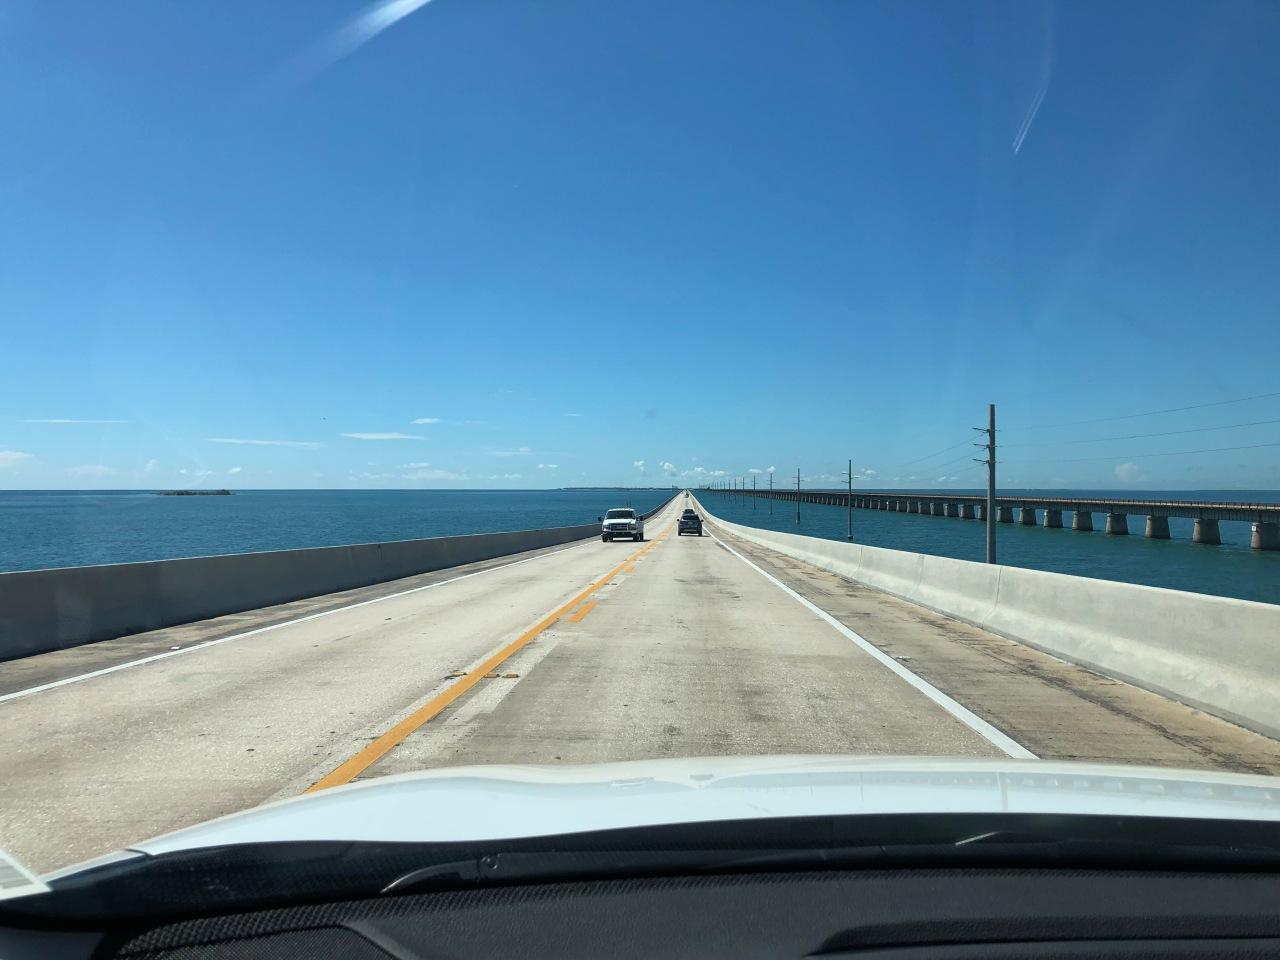 Driving Florida's epic Overseas Highway, across the Florida Keys to KeyWest.